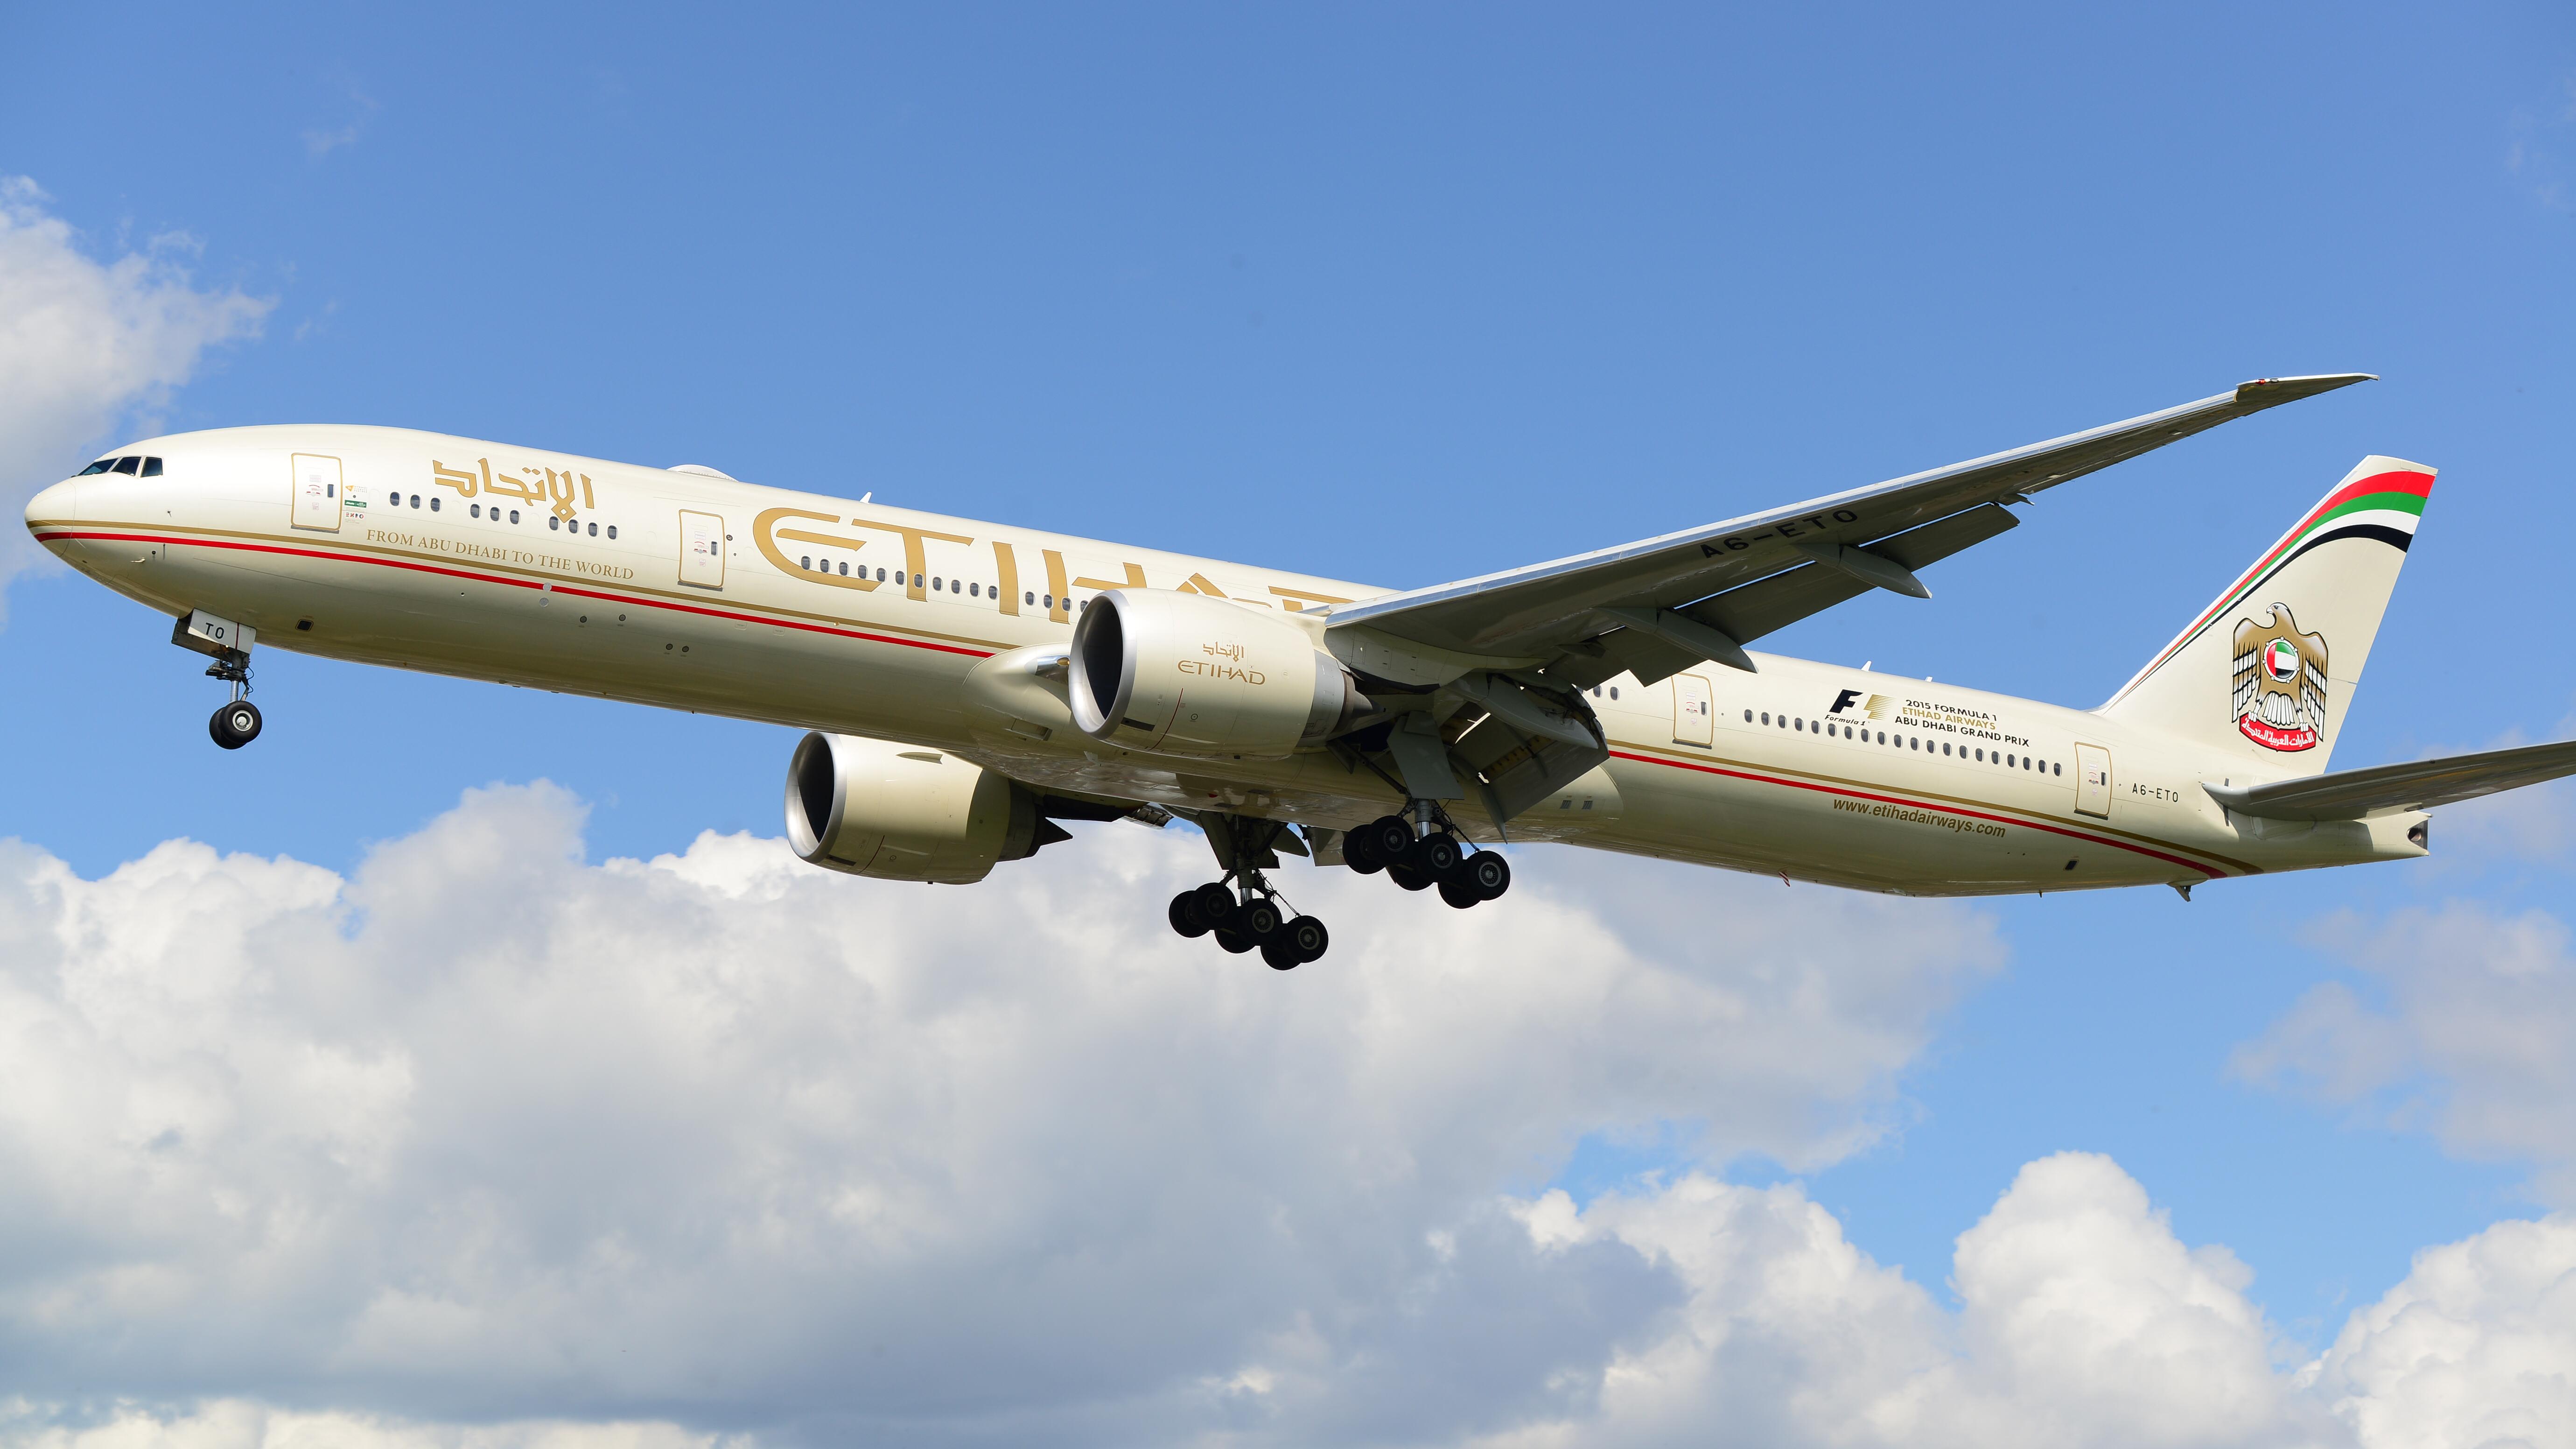 The Etihad Airways Chauffeur Service